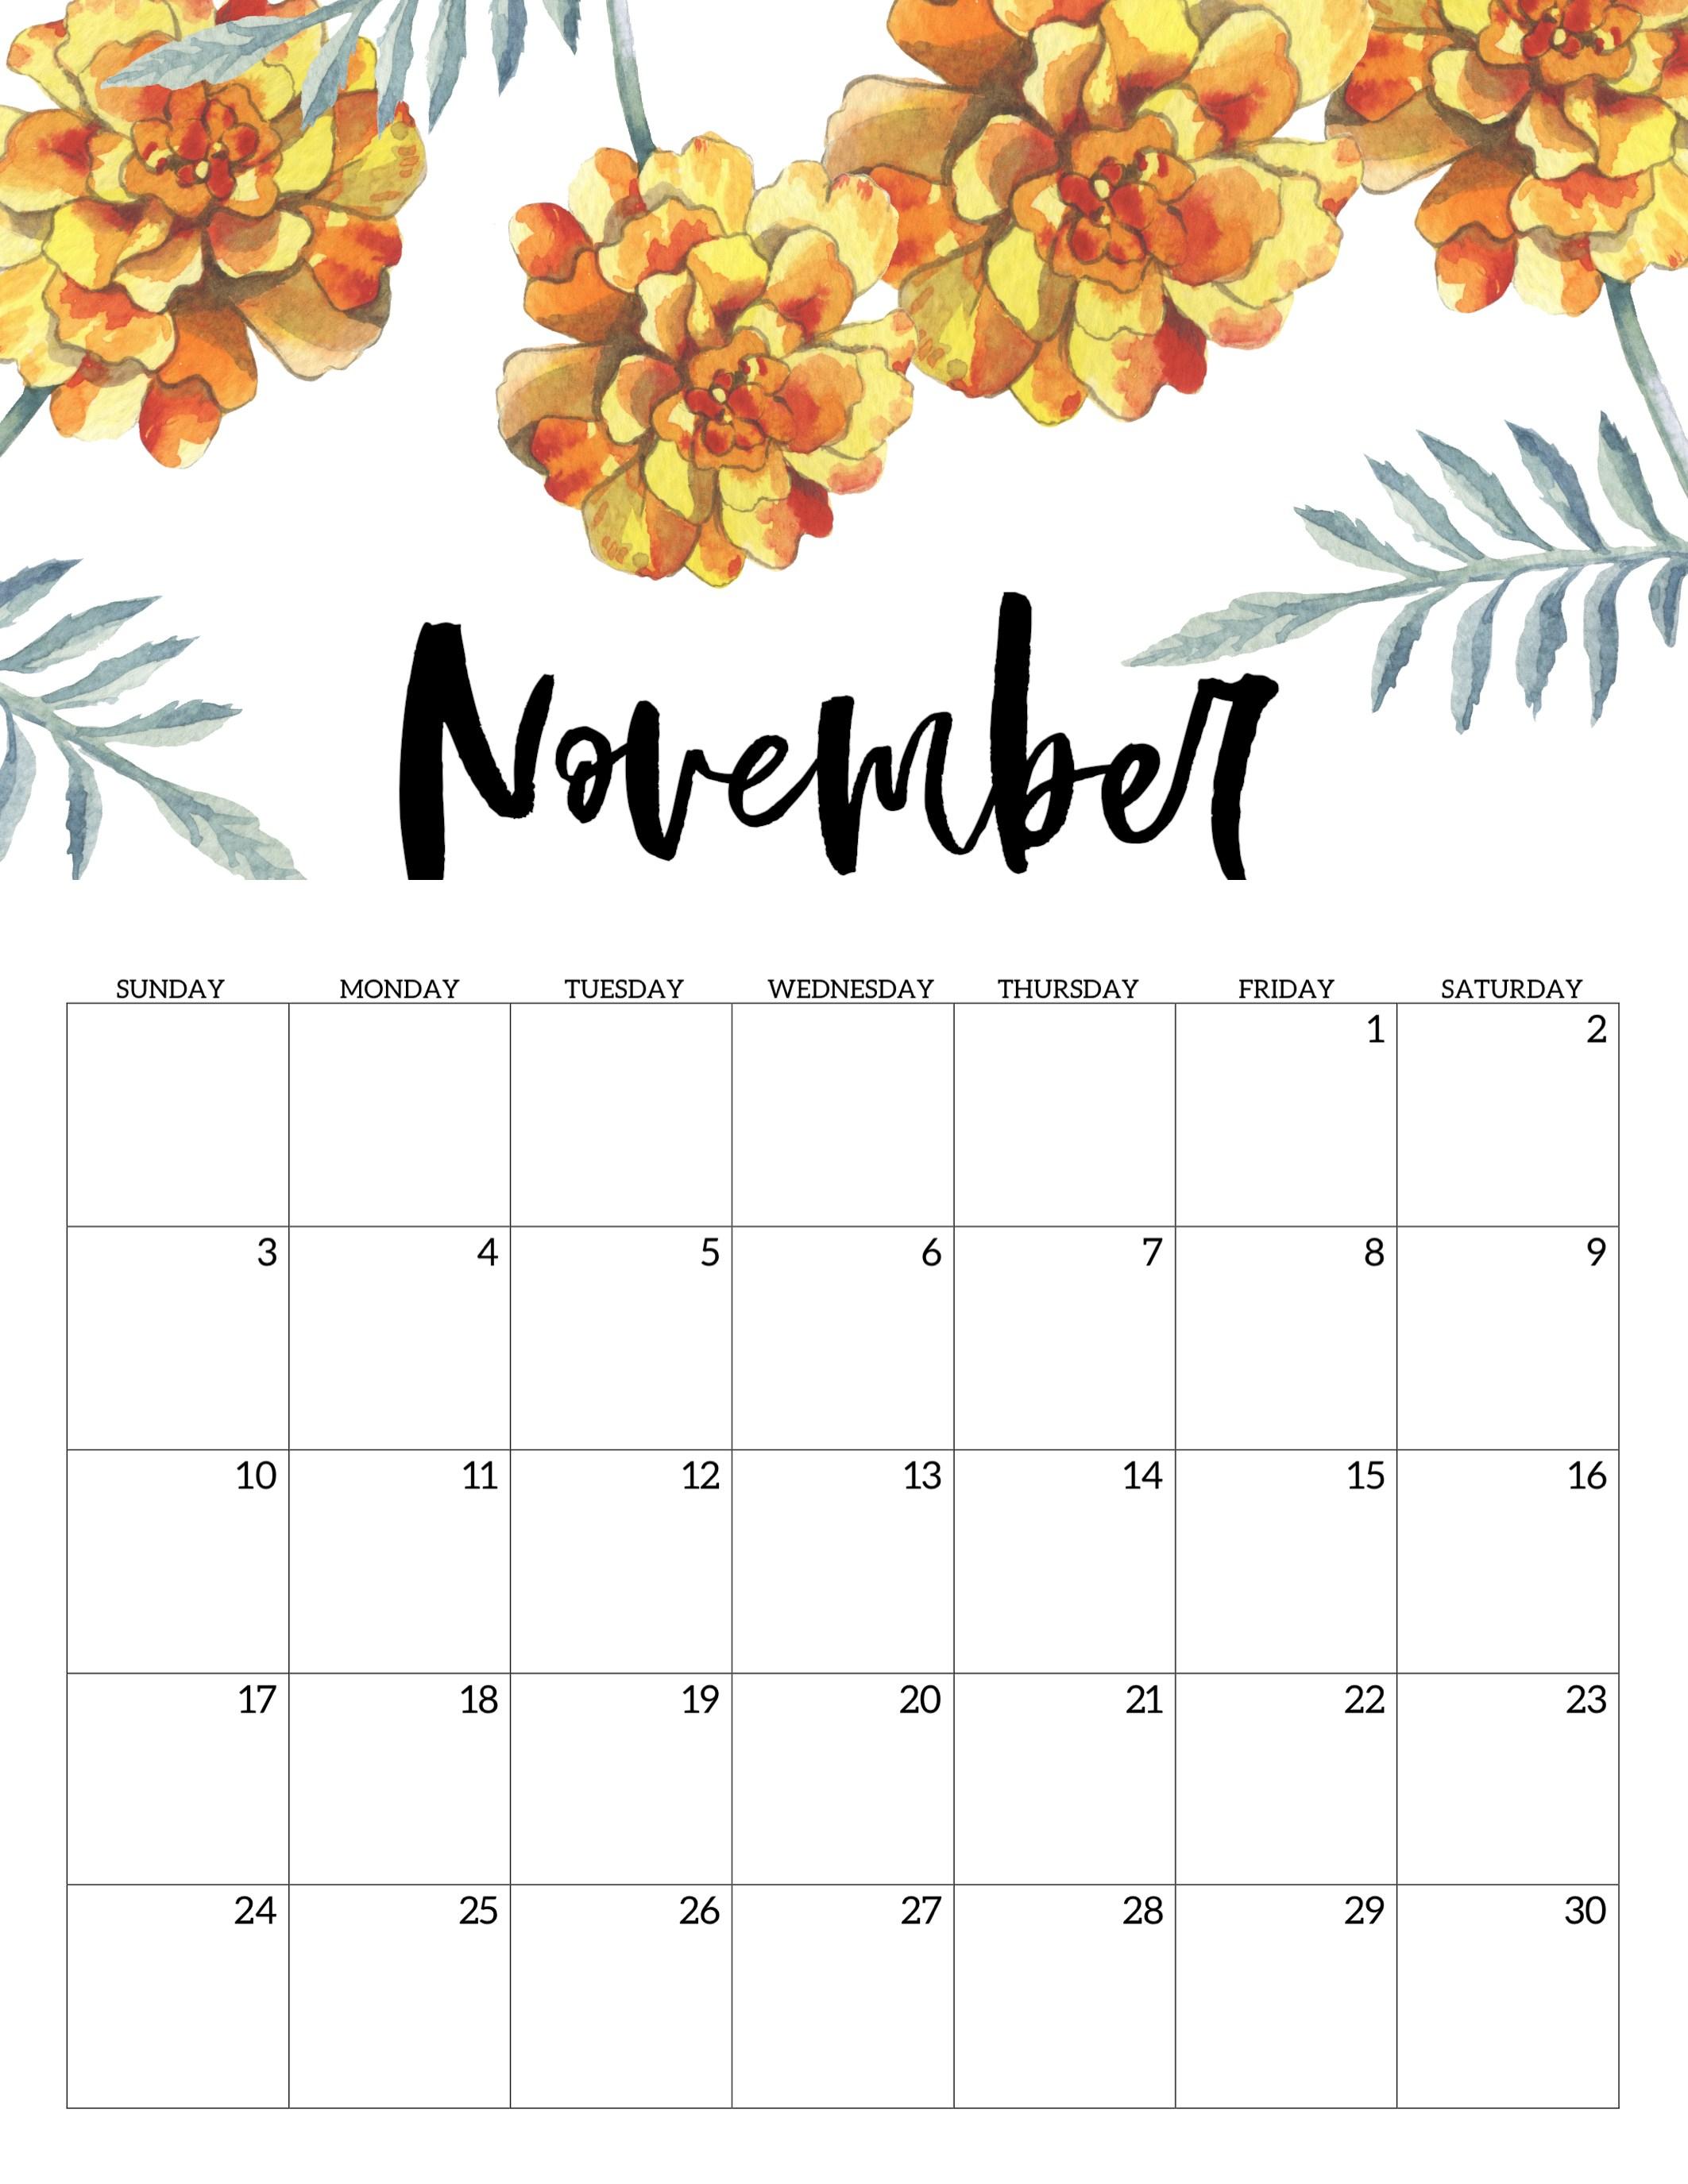 Free Printable Calendar 2019 - Floral - Paper Trail Design with regard to Decorative Printable Calendar Templates